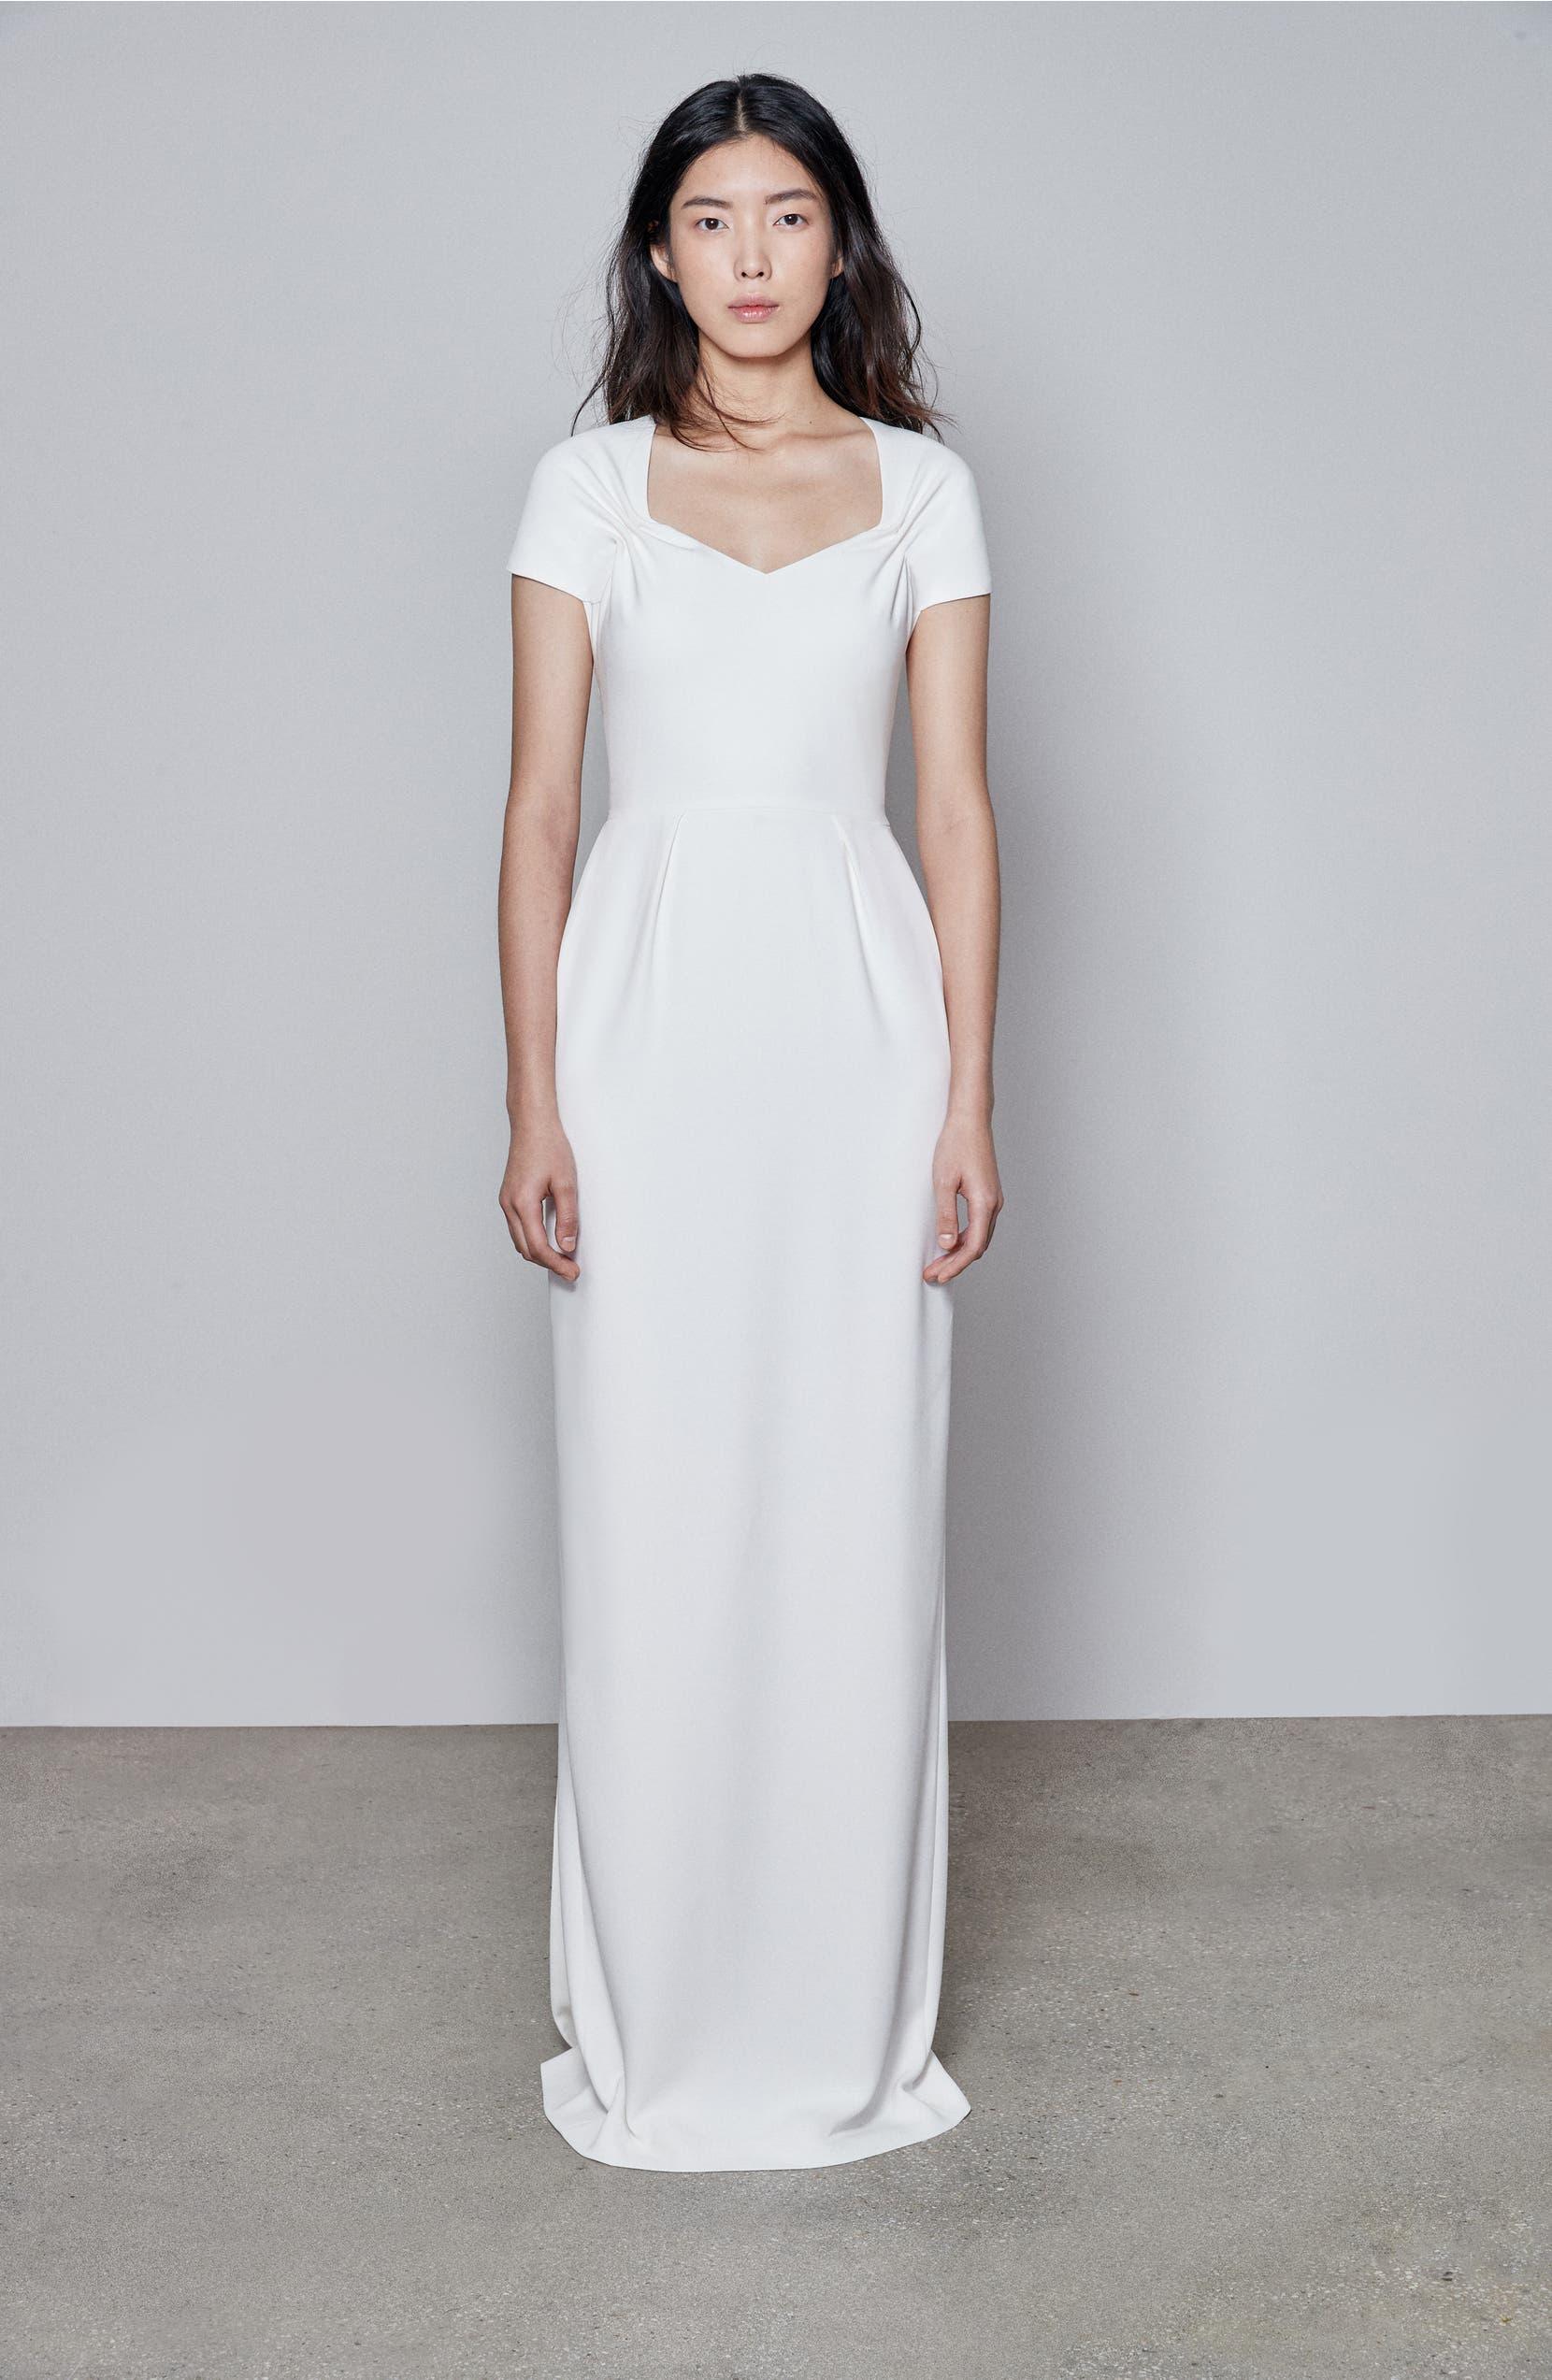 adf9896e9be86 Stella McCartney F18 Rose Cap Sleeve Wedding Dress | Nordstrom